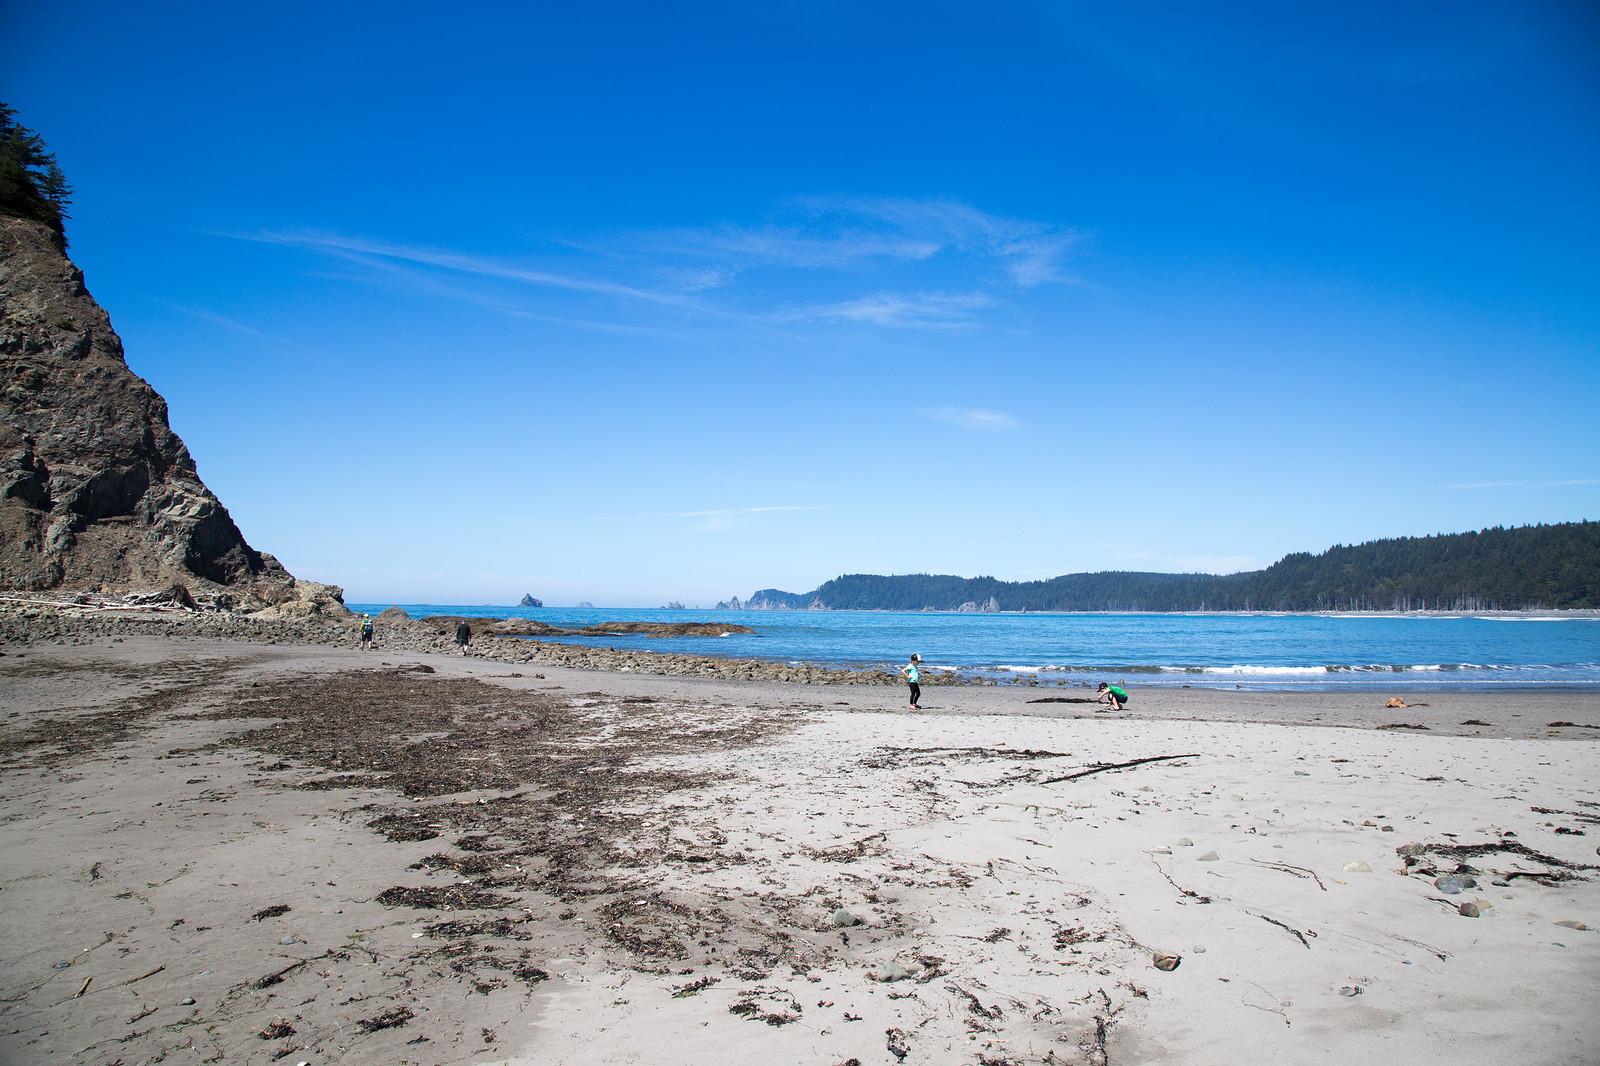 2015-08-24 Lake Sutherland-2737.jpg